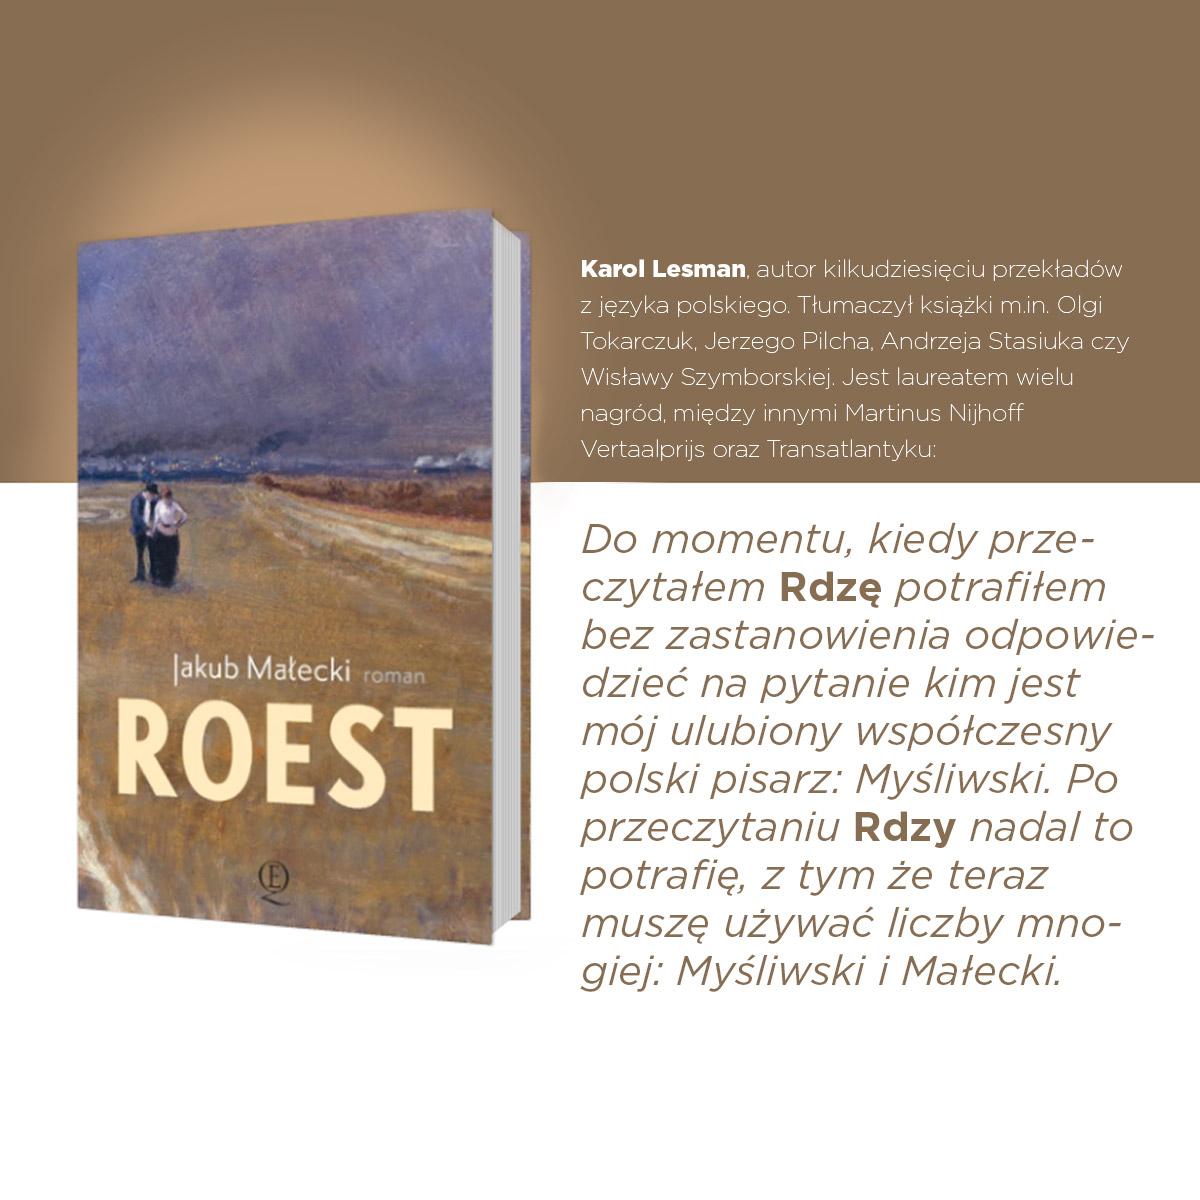 malecki-roest